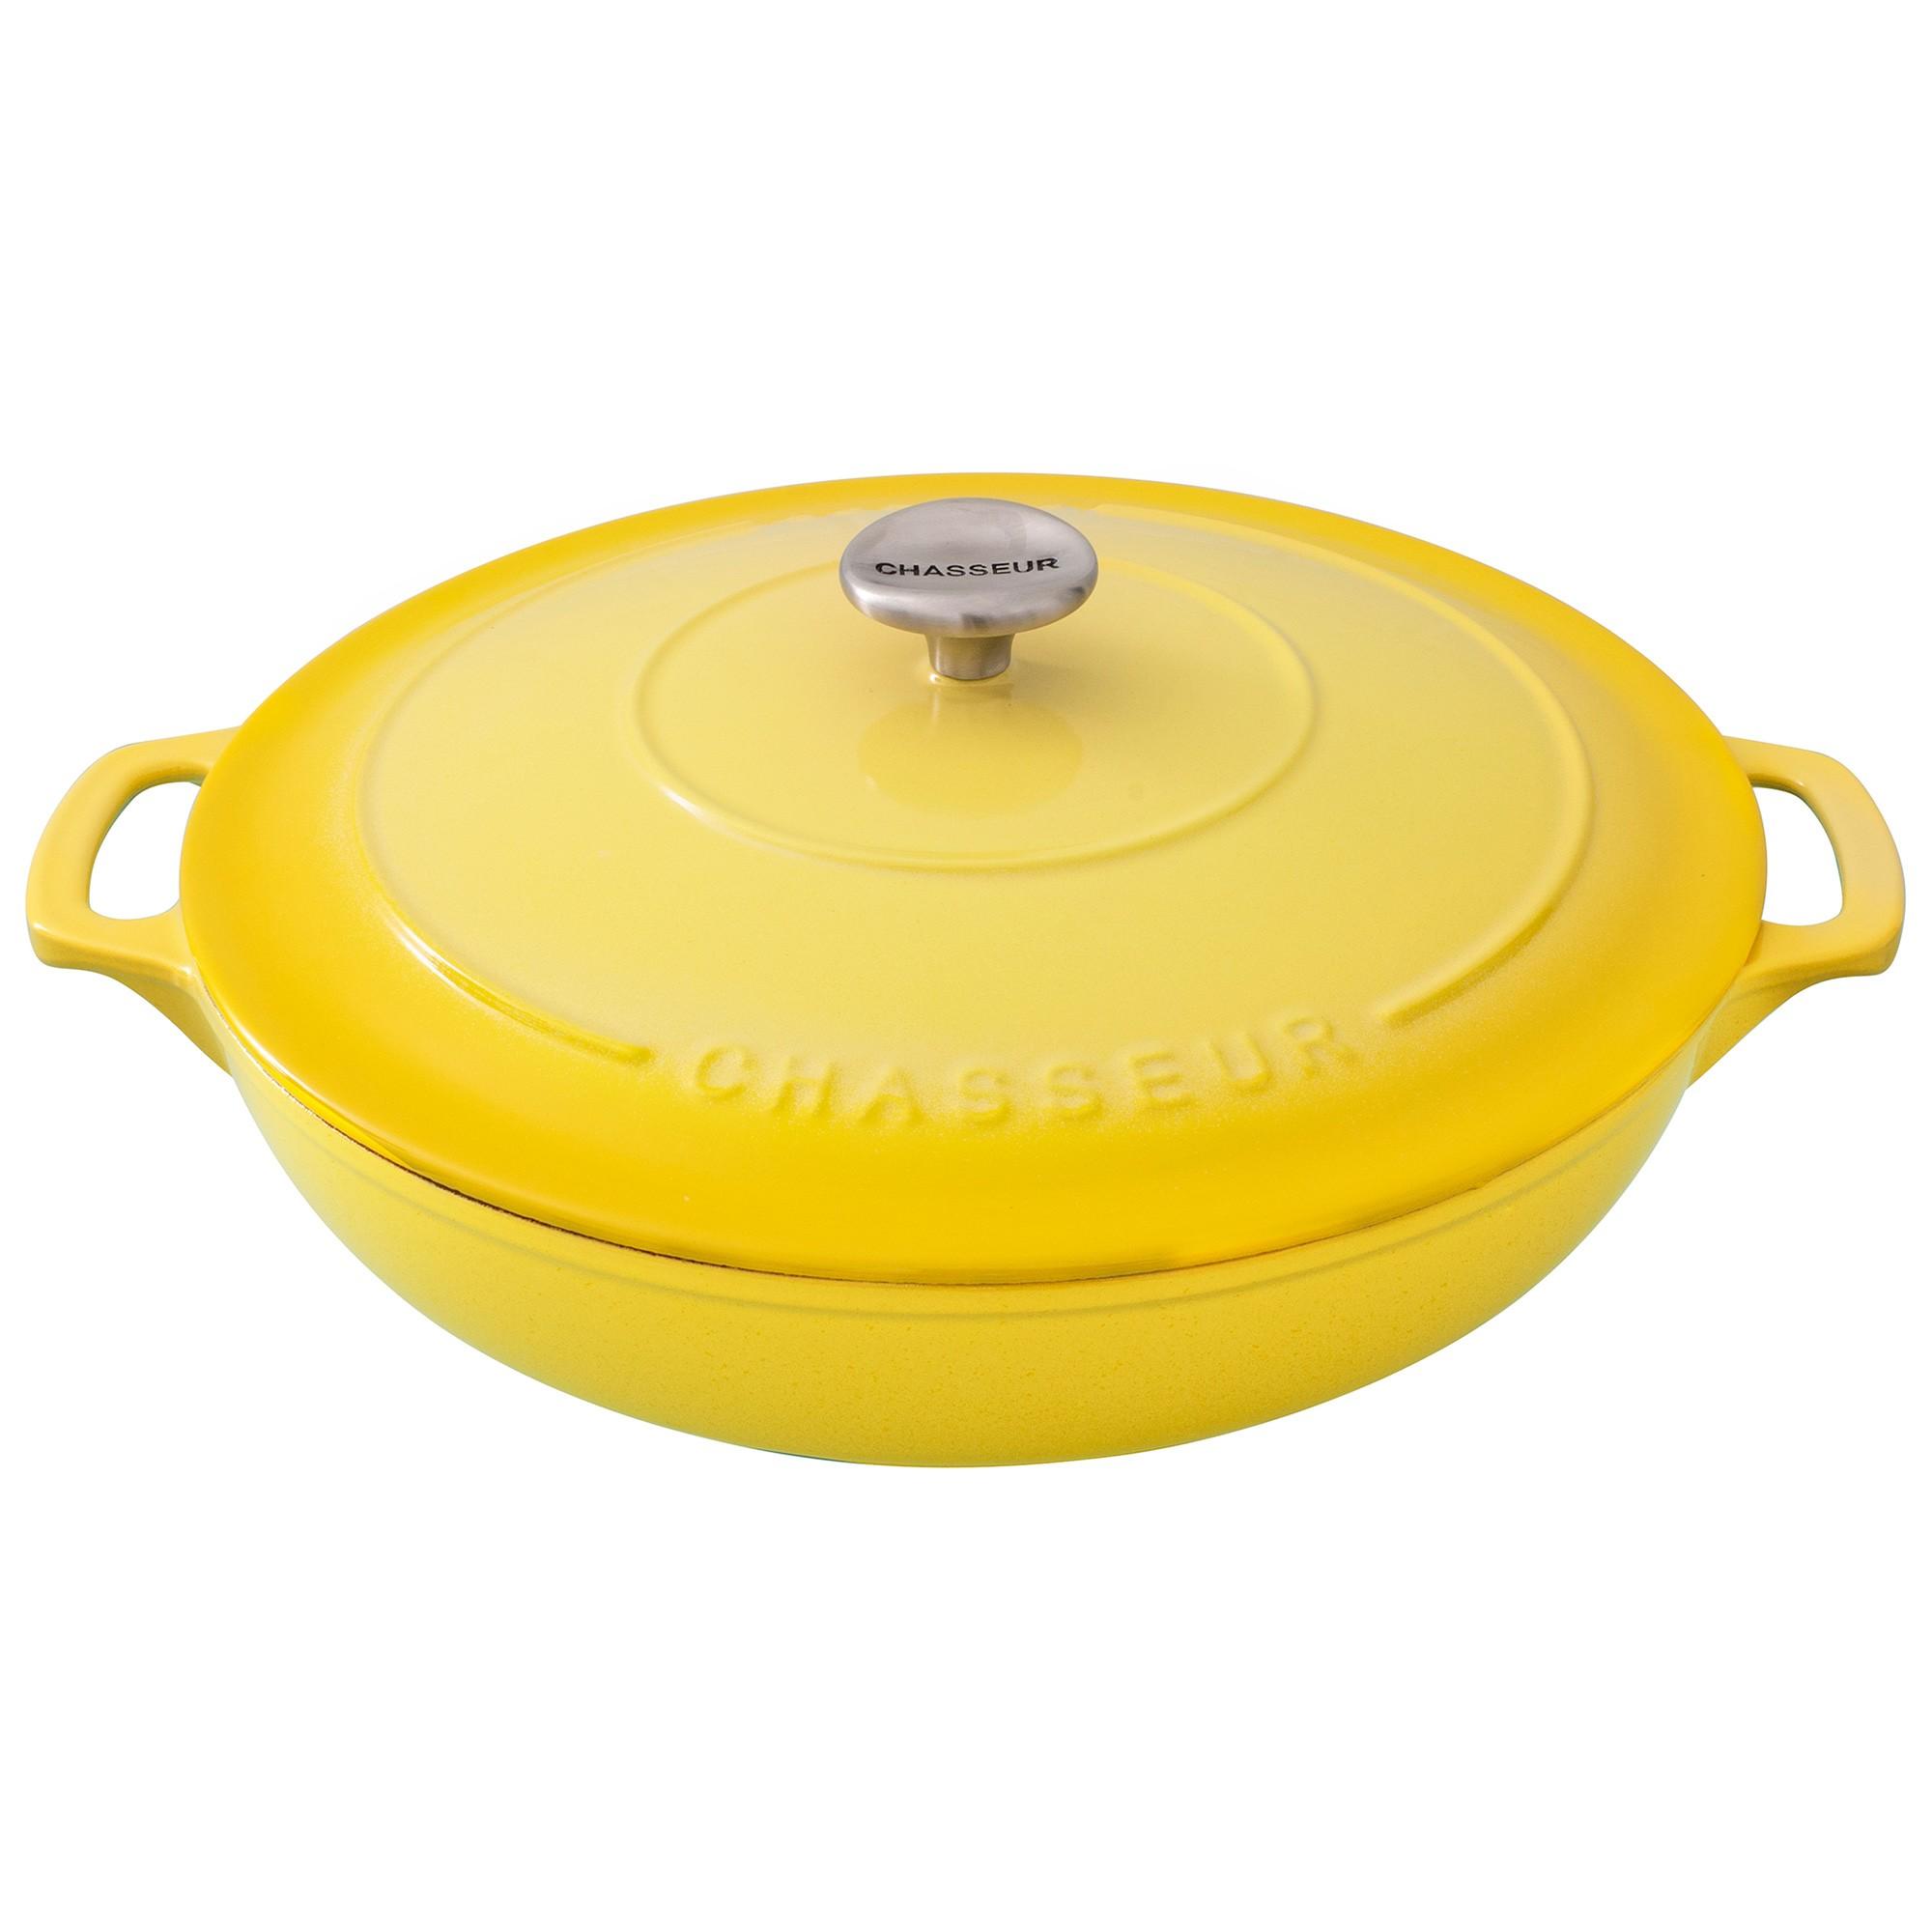 Chasseur Cast Iron Round Casserole, 30cm, Lemon Yellow